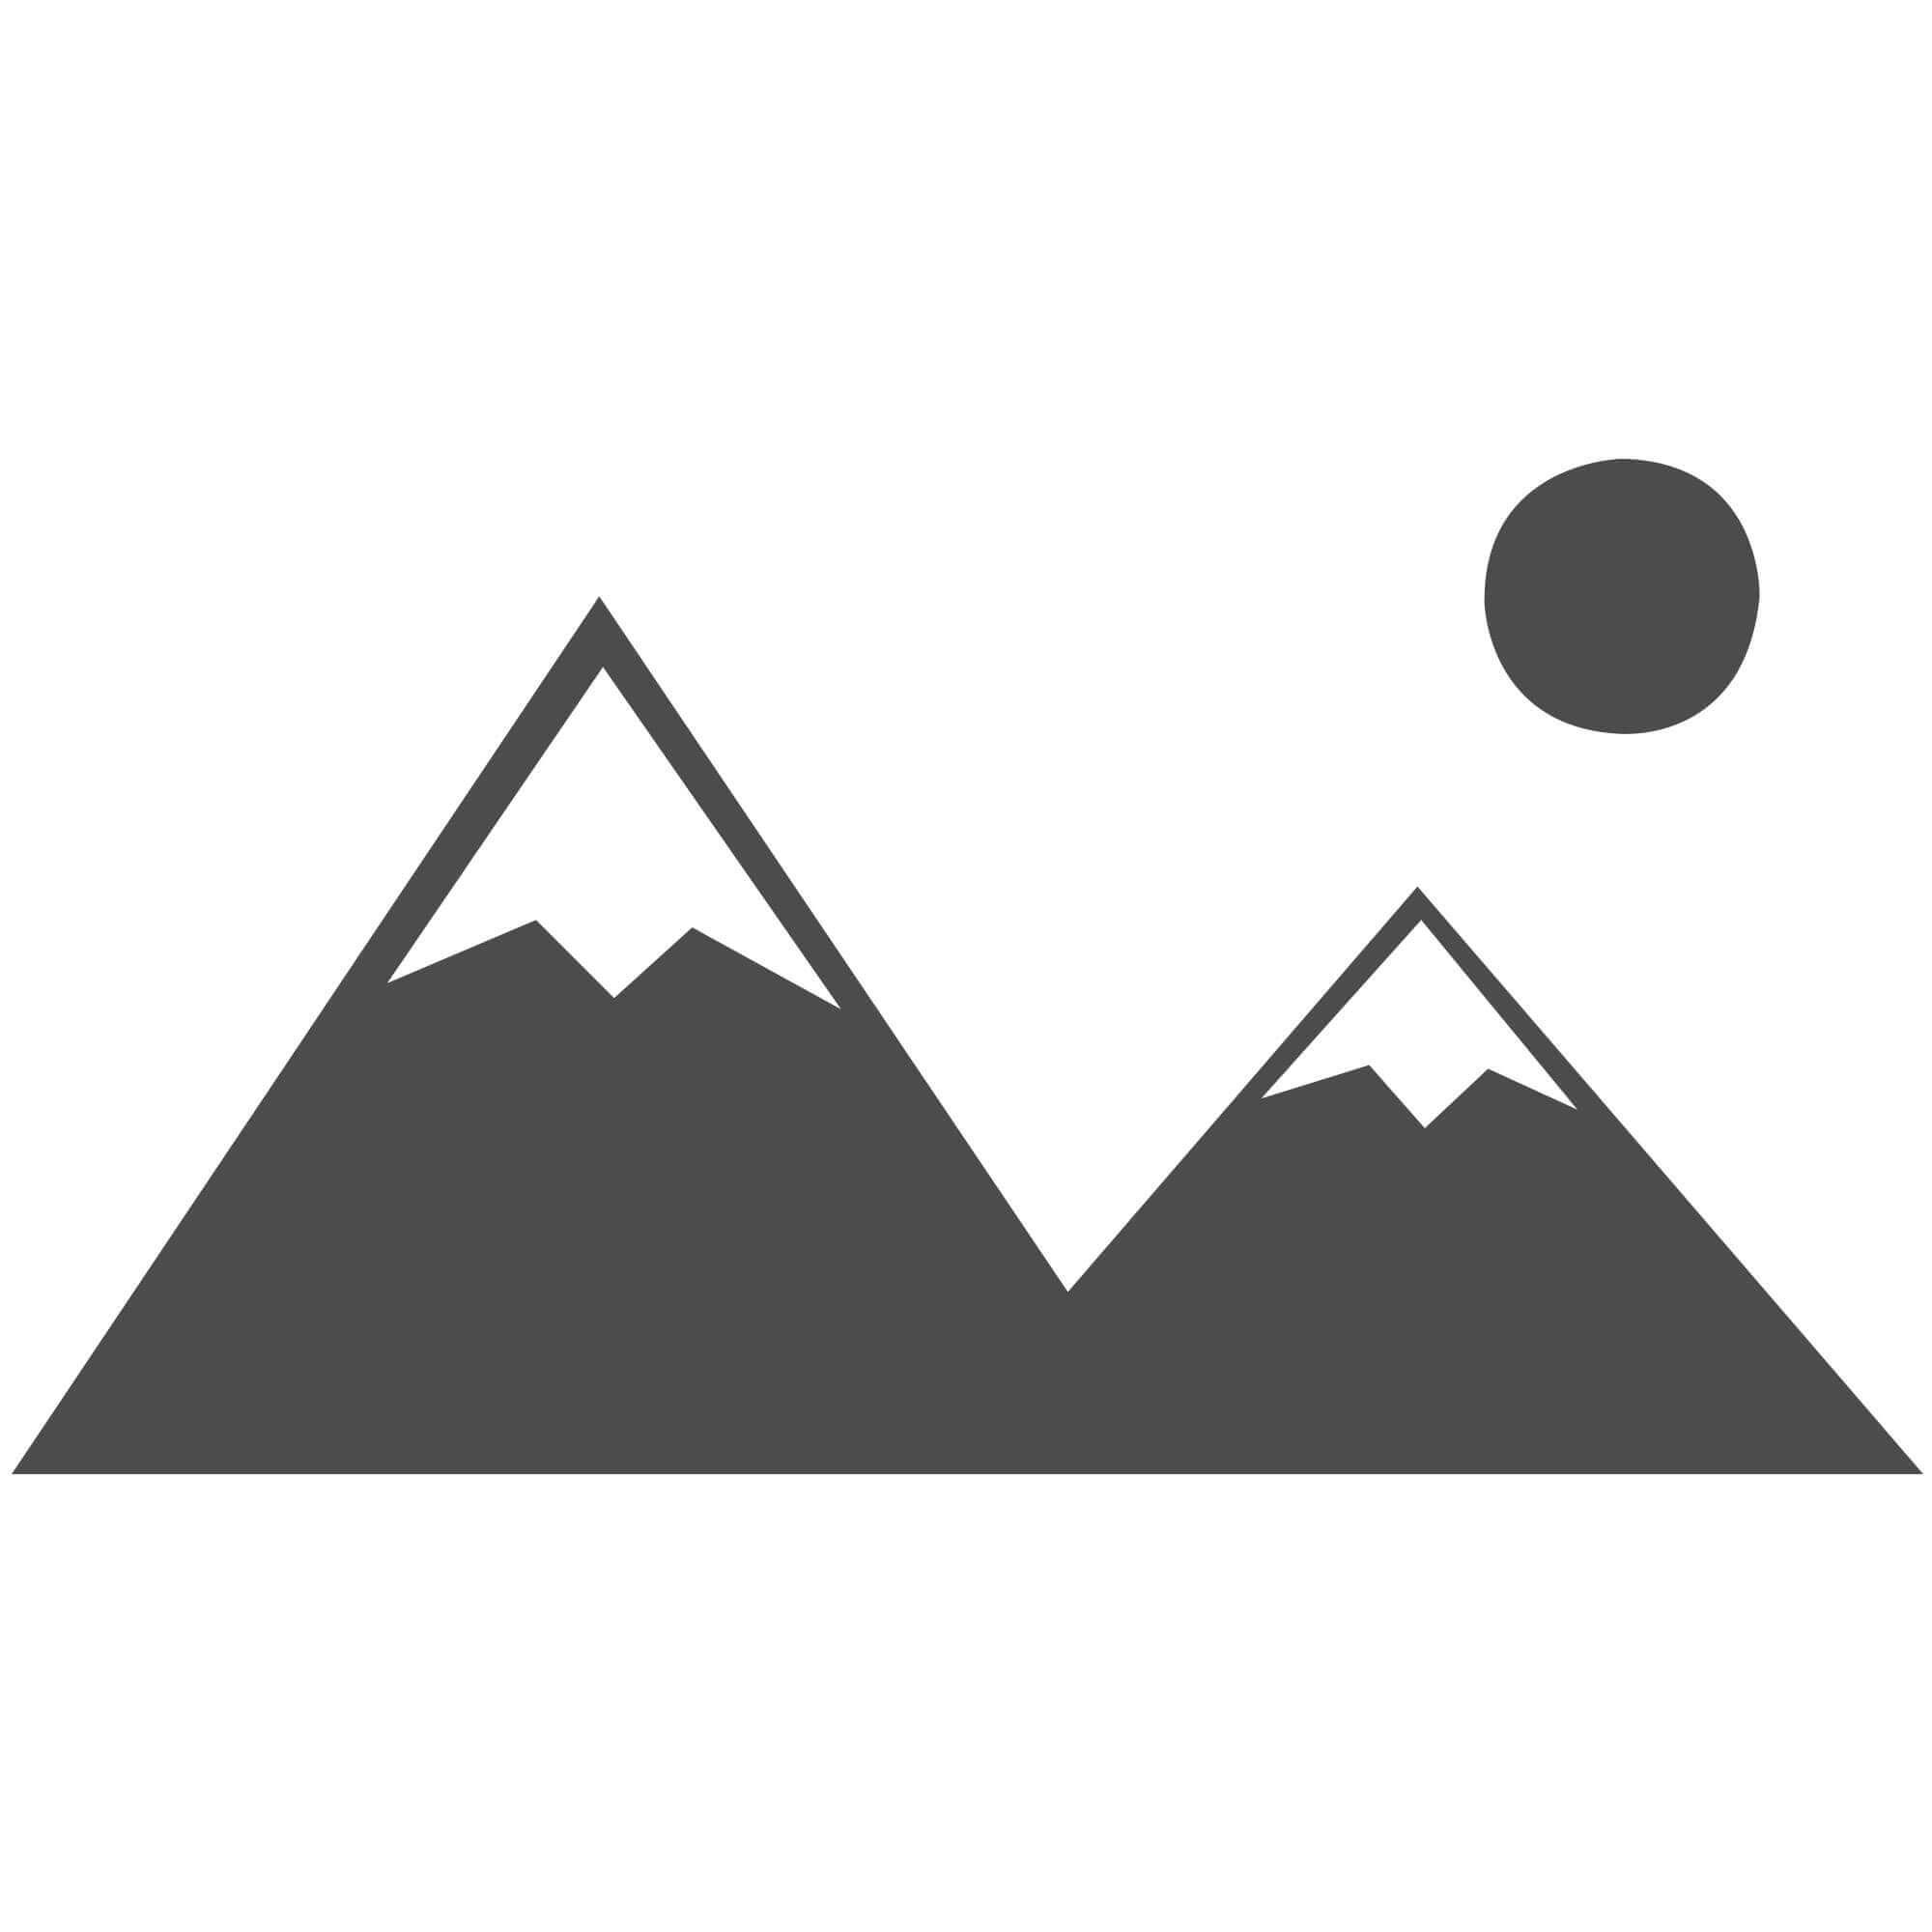 "Alhambra Traditional Rug - 6594b ivory/green - Size 133 x 195 cm (4'4"" x 6'5"")"